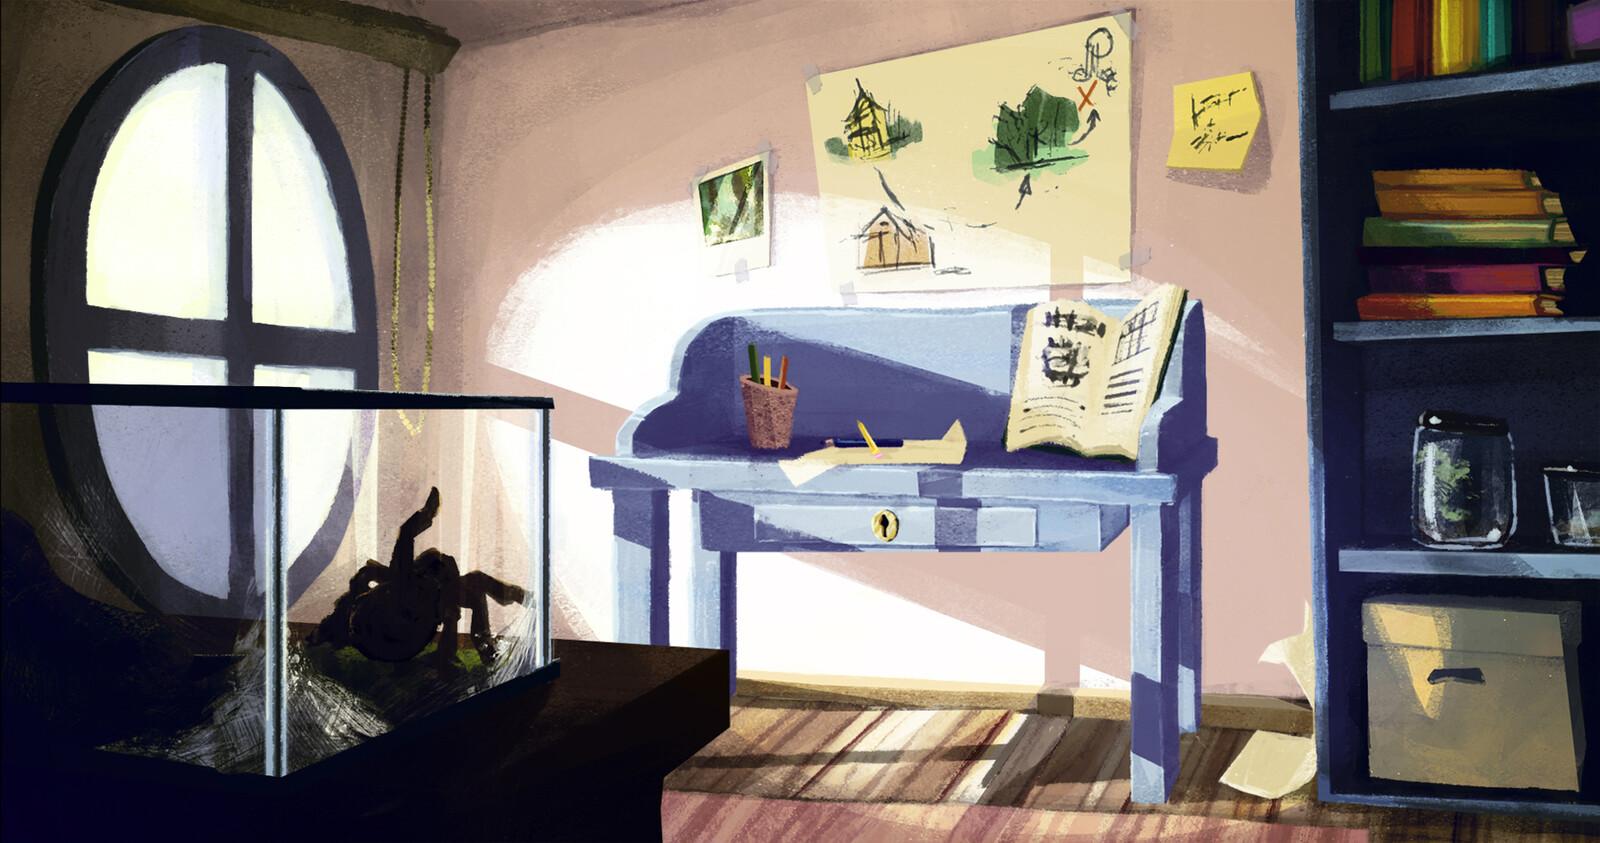 Little adventurer's room